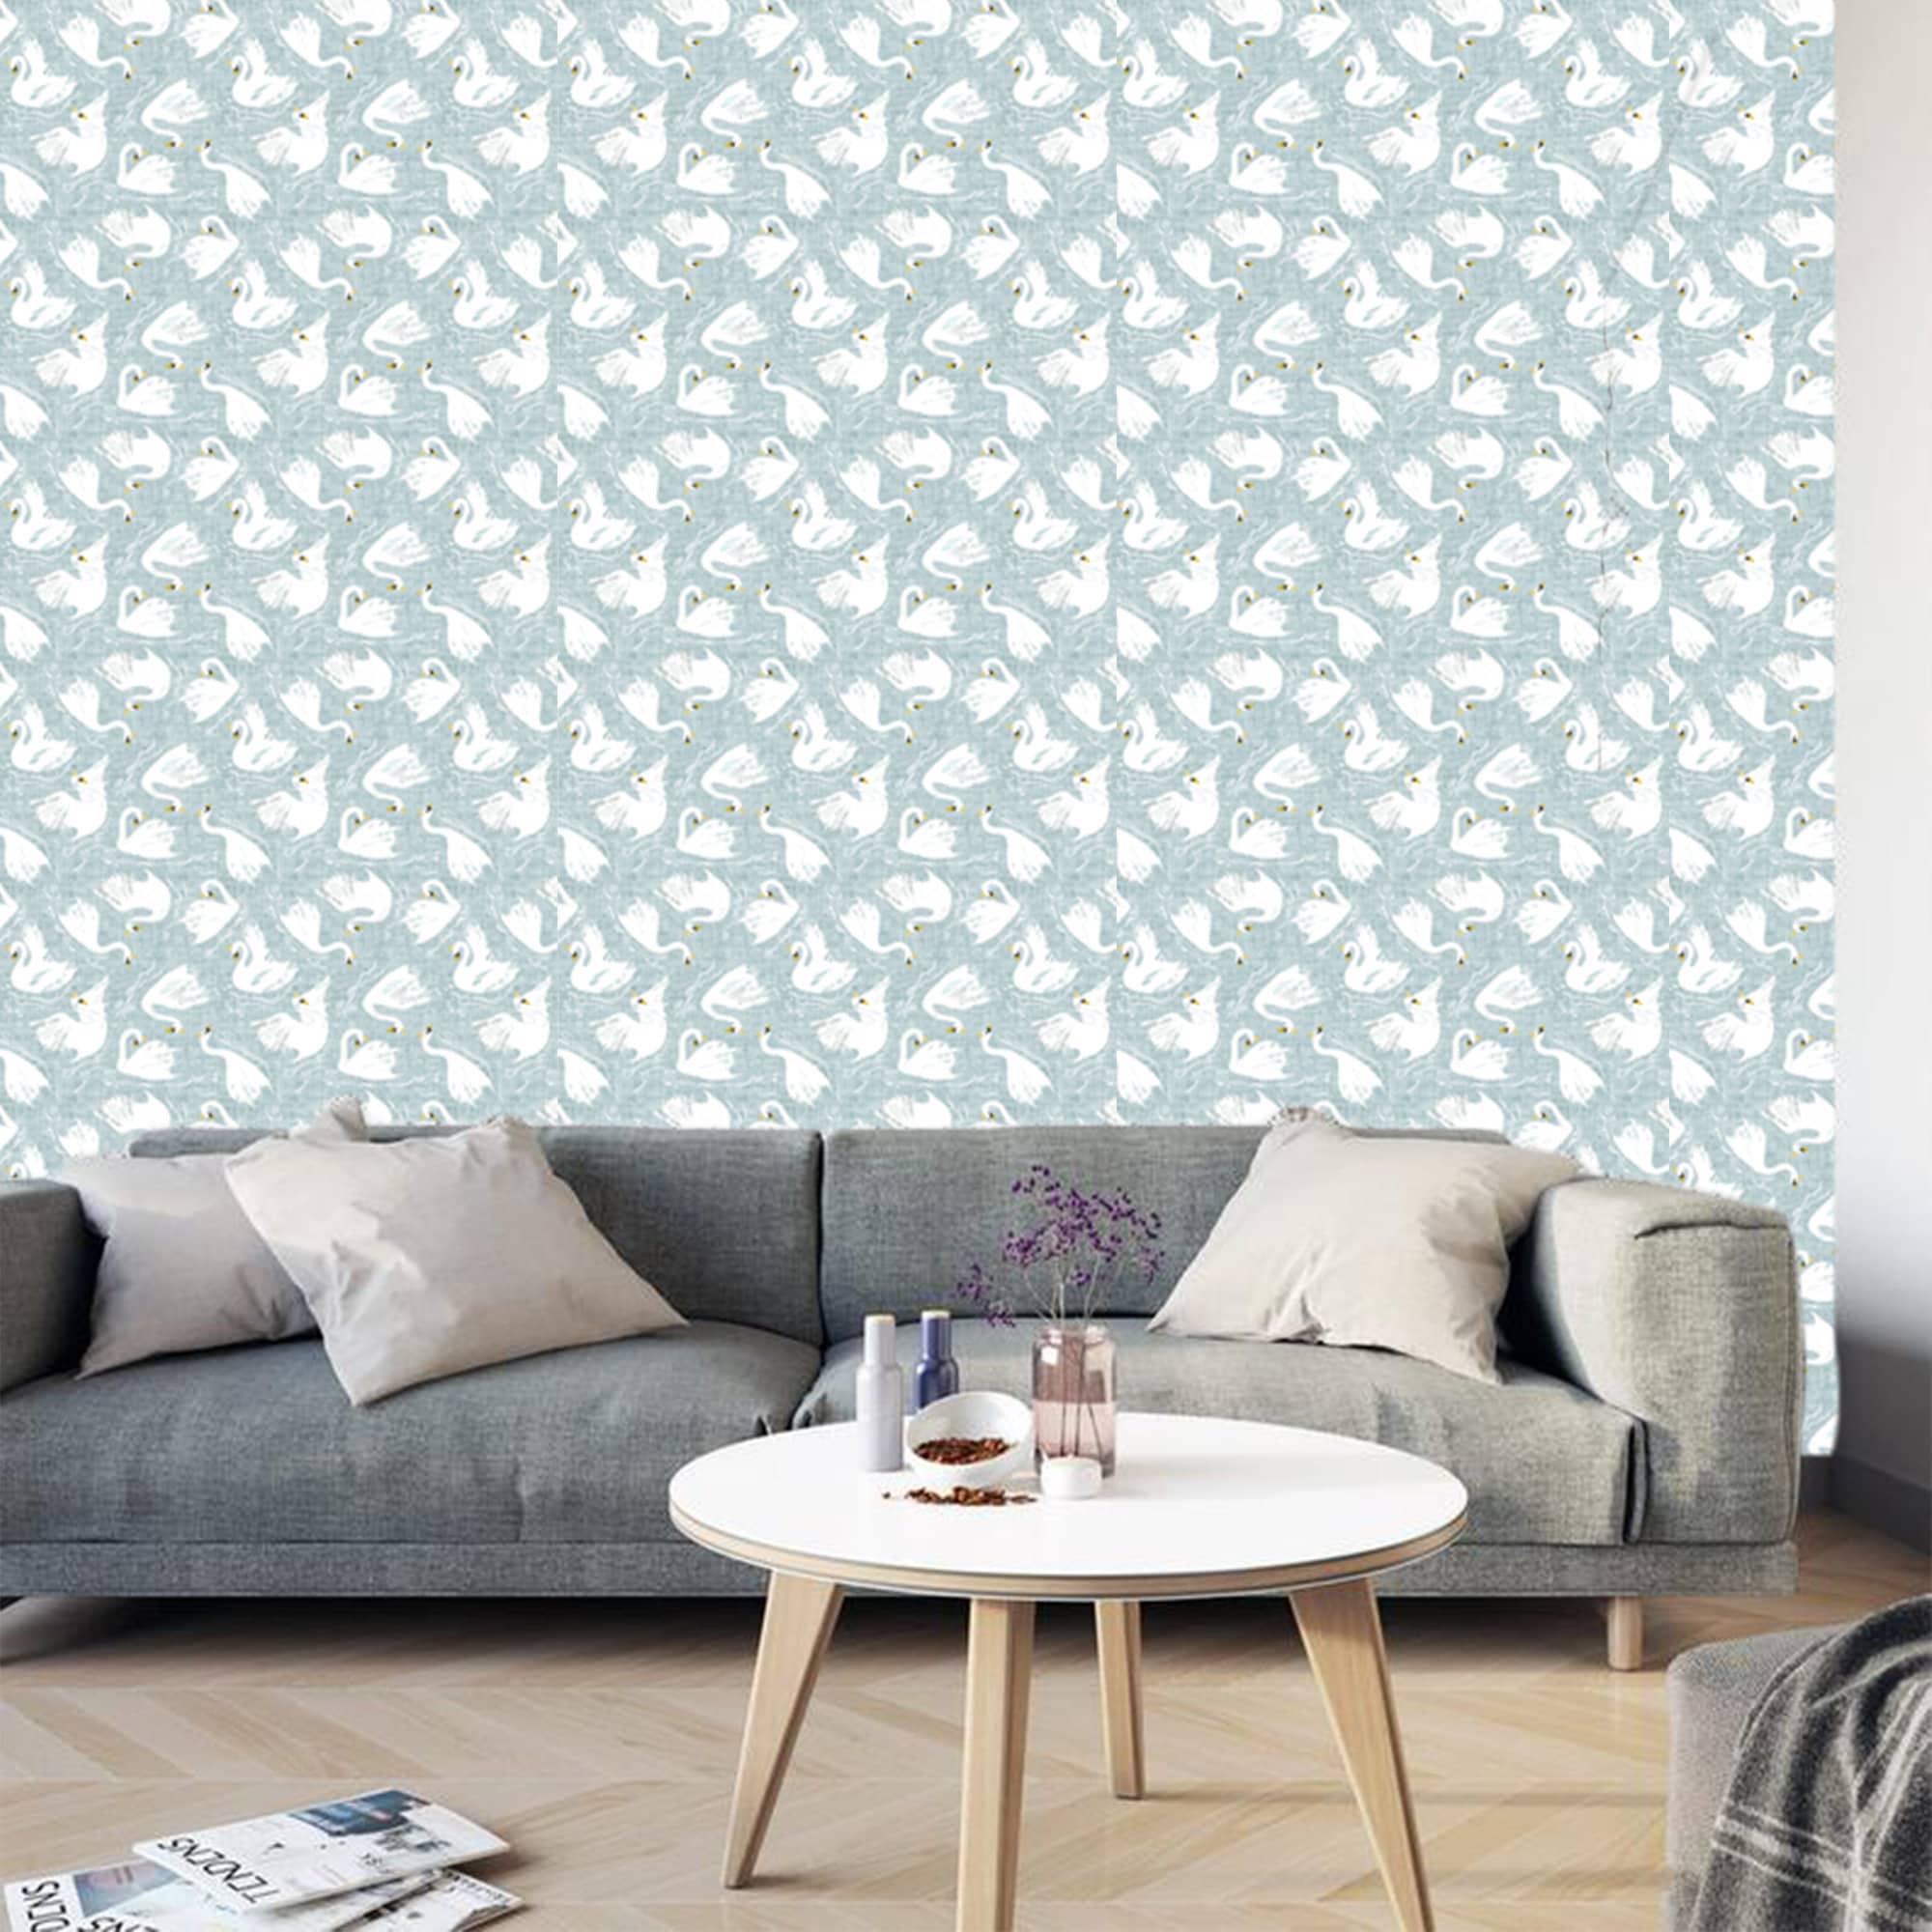 Blue White Swan Wallpaper Removable Traditional Wallpaper Peel And Stick Wallpaper Animal Print Wallpaper Self Adhesive Wallpaper